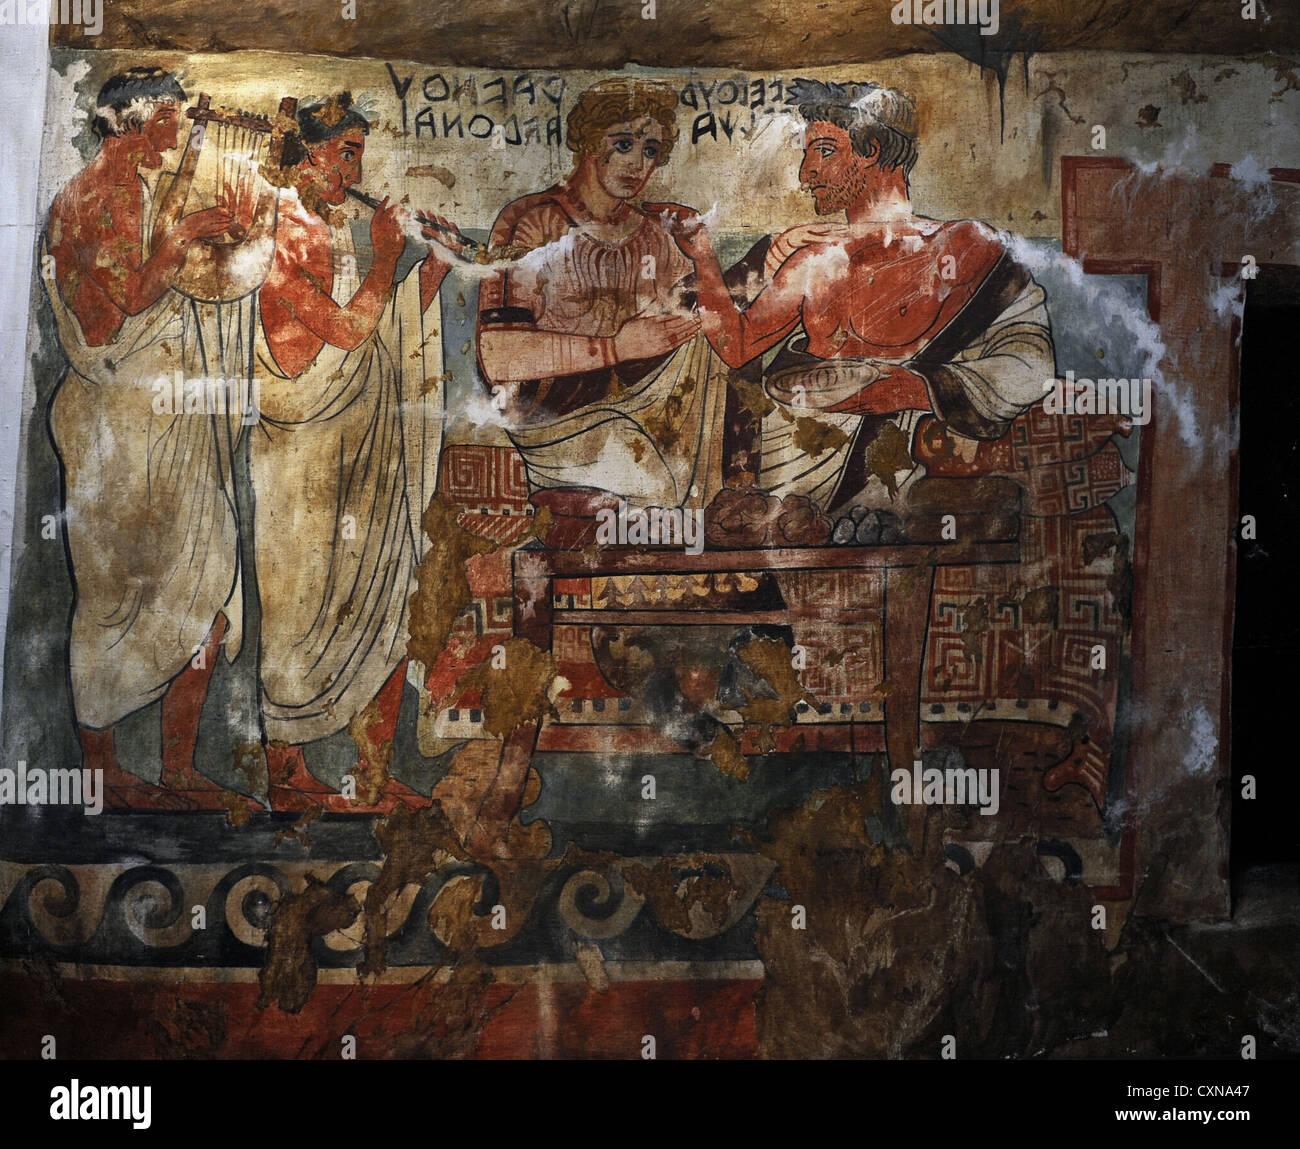 Etruscan Art. Tomb of the Shields. Tarquinia. Velhur Velcha and his wife, Ravnthu Aprthnei. Ny Carlsberg Glyptotek. - Stock Image